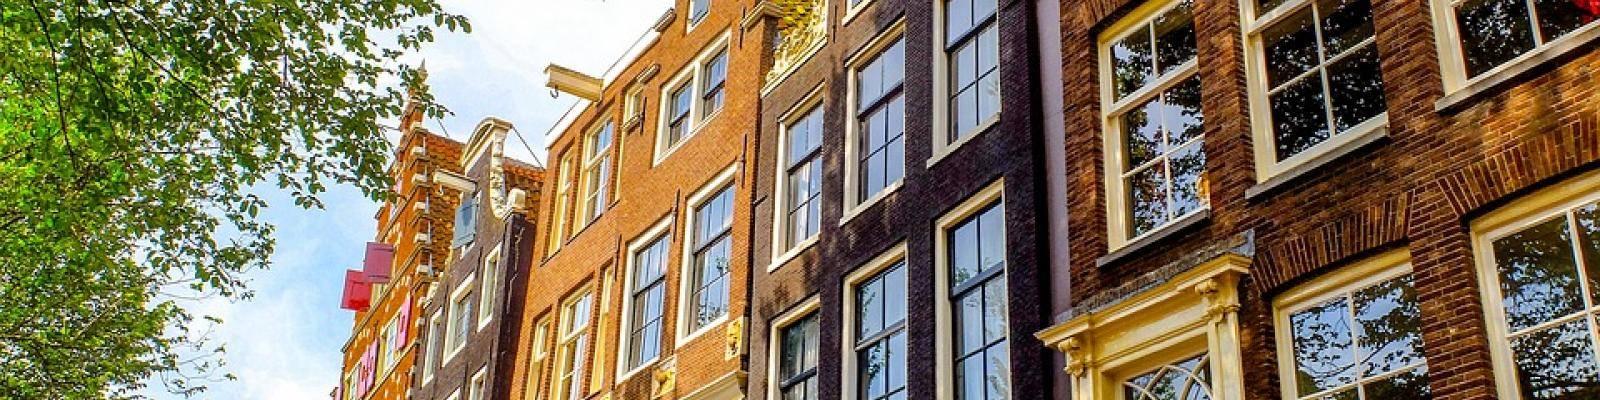 Grachtenhuizen Amsterdam